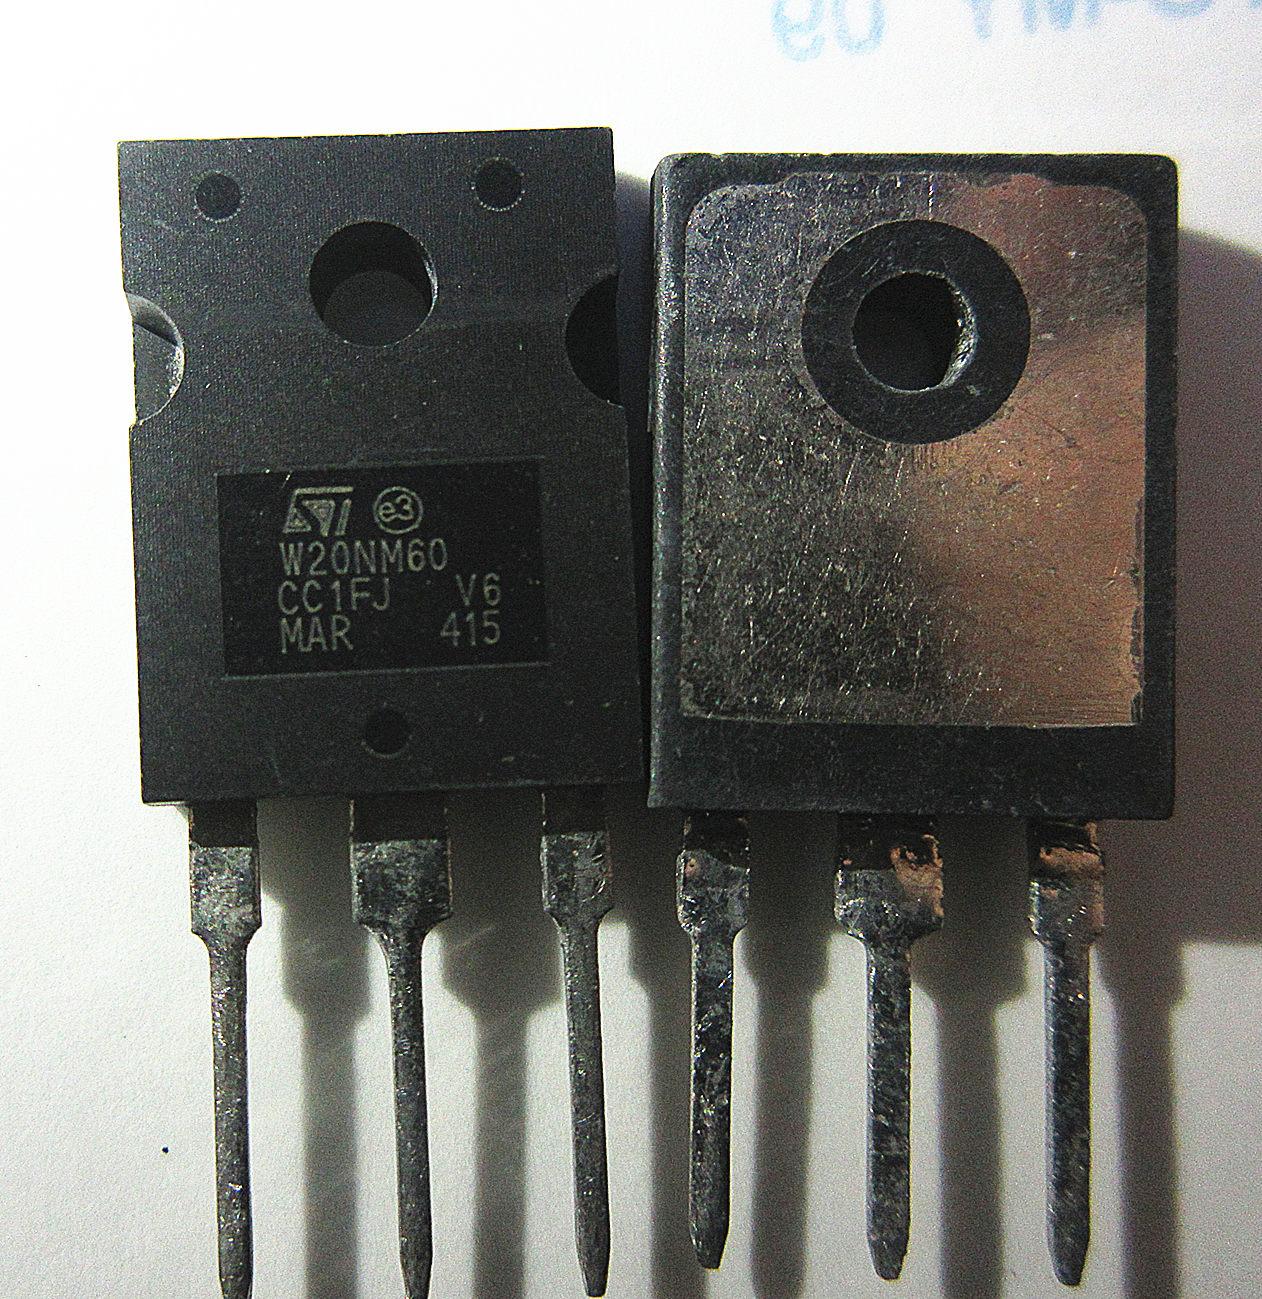 10pcs W20NM60 STW20NM60 20N60 20A600V Original Novo 1 ordem